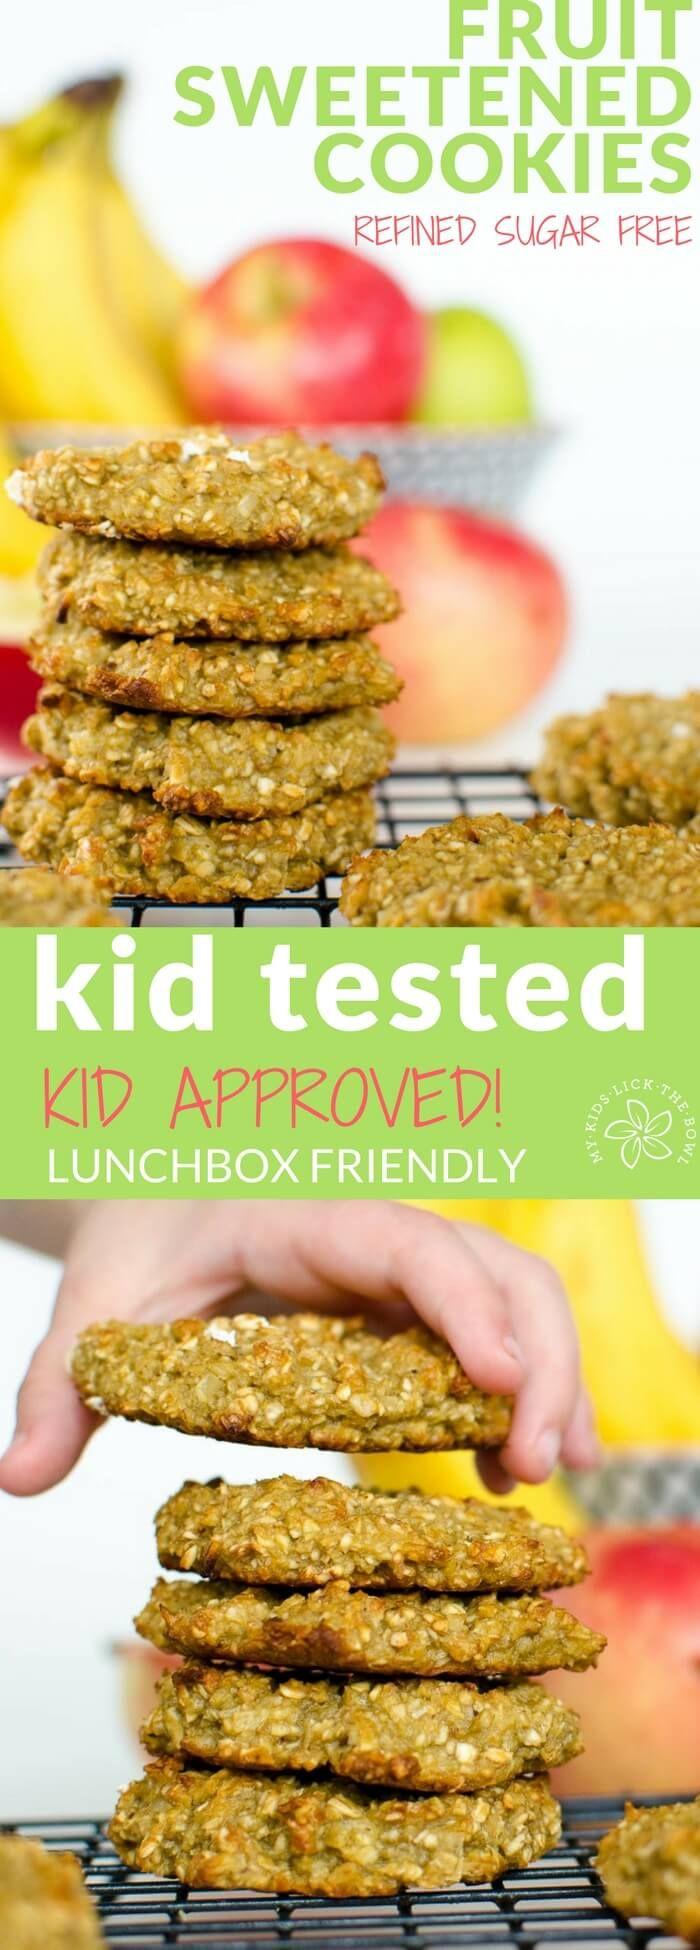 fruit sweetened cookies, easy healthy recipe, banana, apple sauce and oatmeal, wheat free, kid friendly